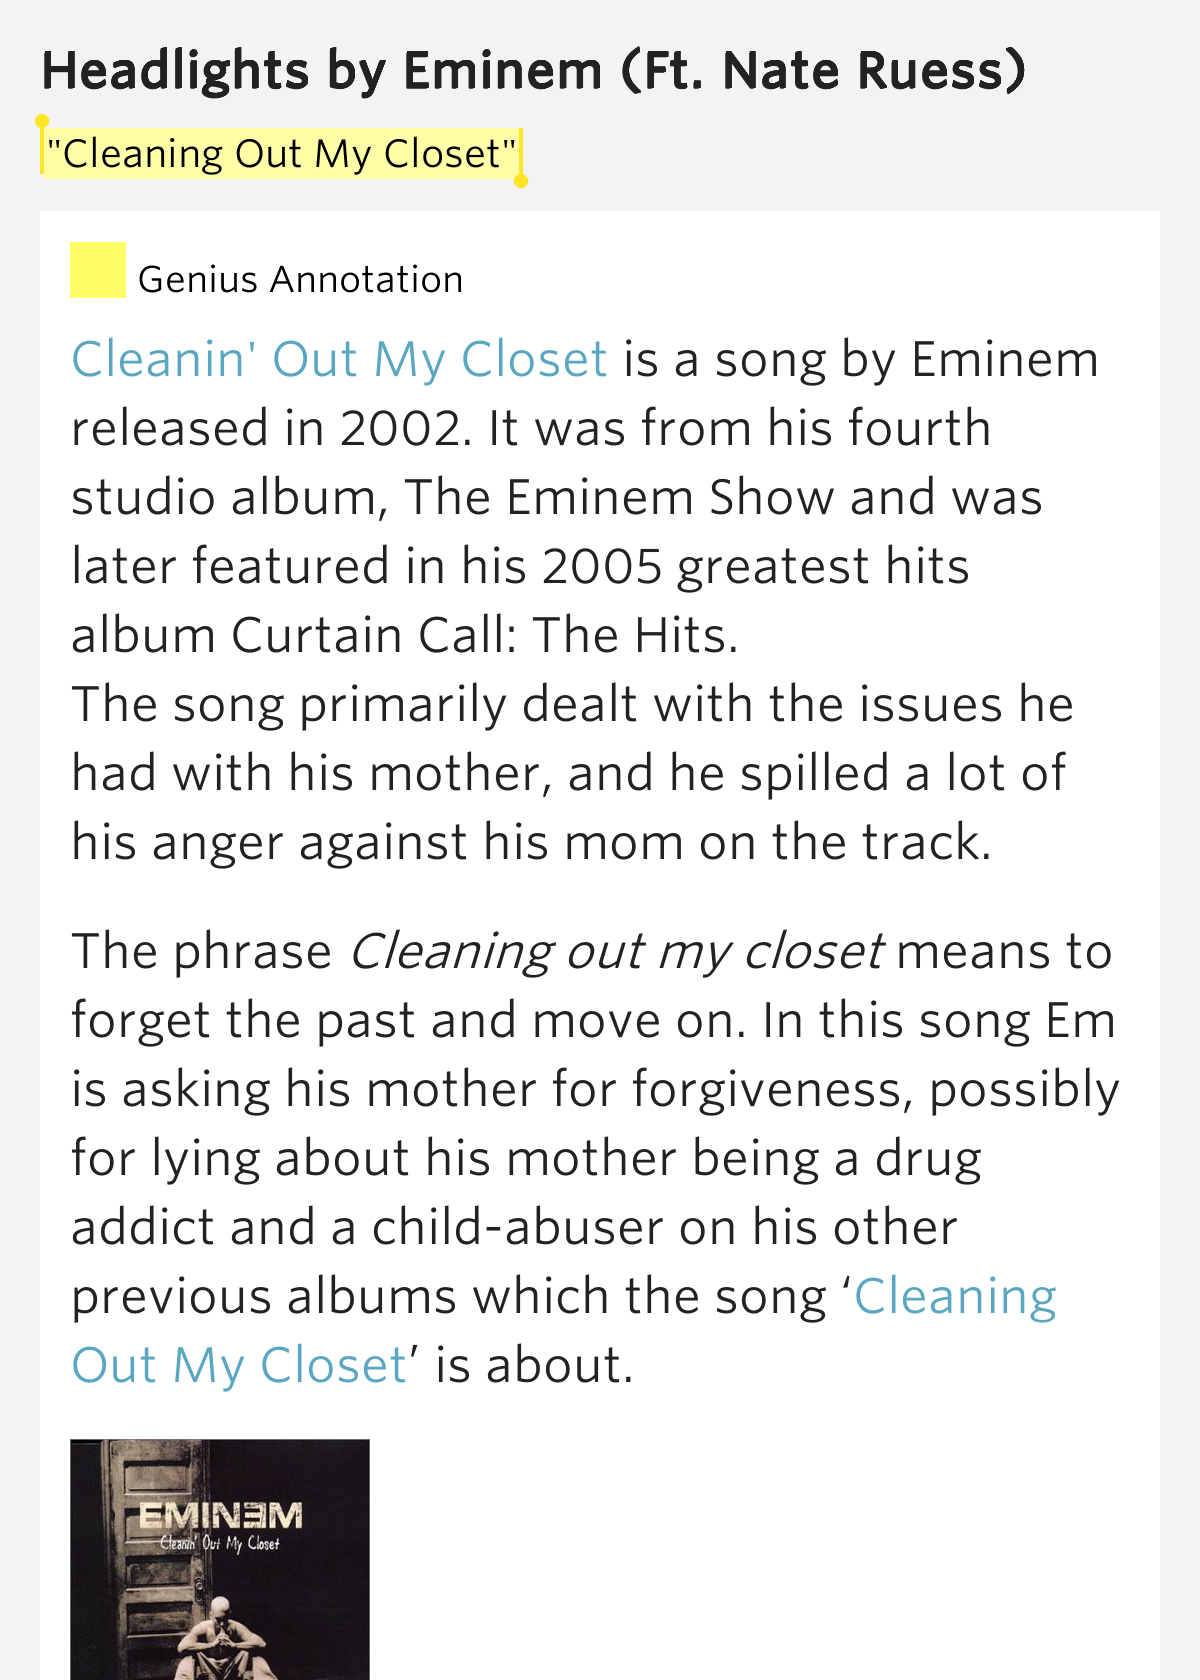 Clean up my closet lyrics